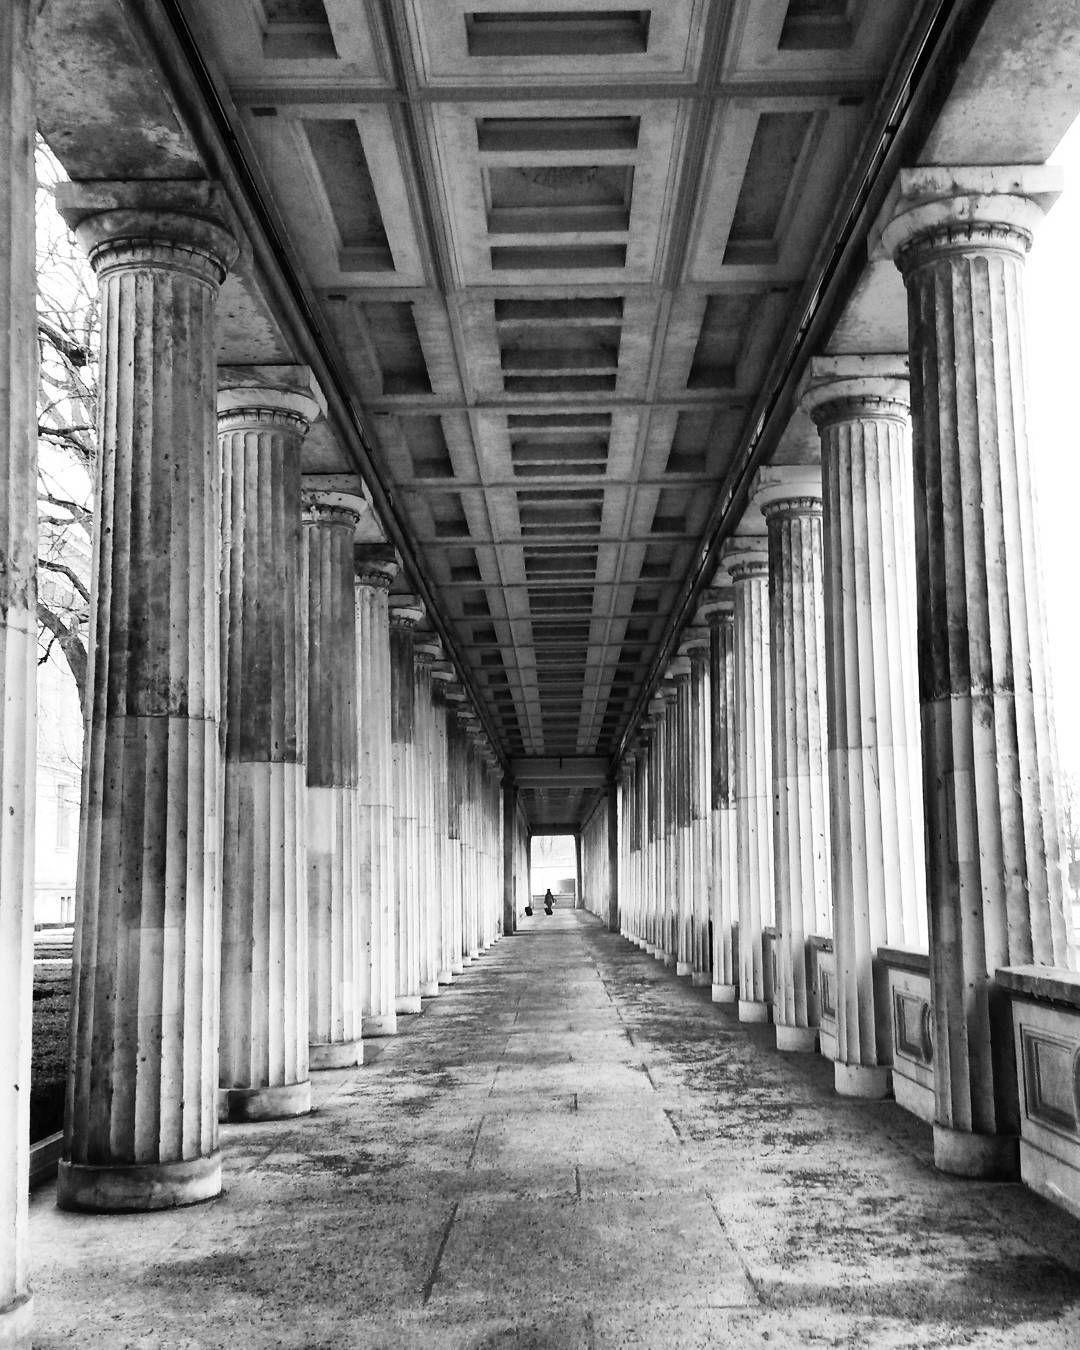 Sanne Ru On Instagram Saulengang Auf Der Museumsinsel In Berlin Berlintrip Visit Berlin Museum Architecturelove Instagram Instagram Posts Fantasy Art